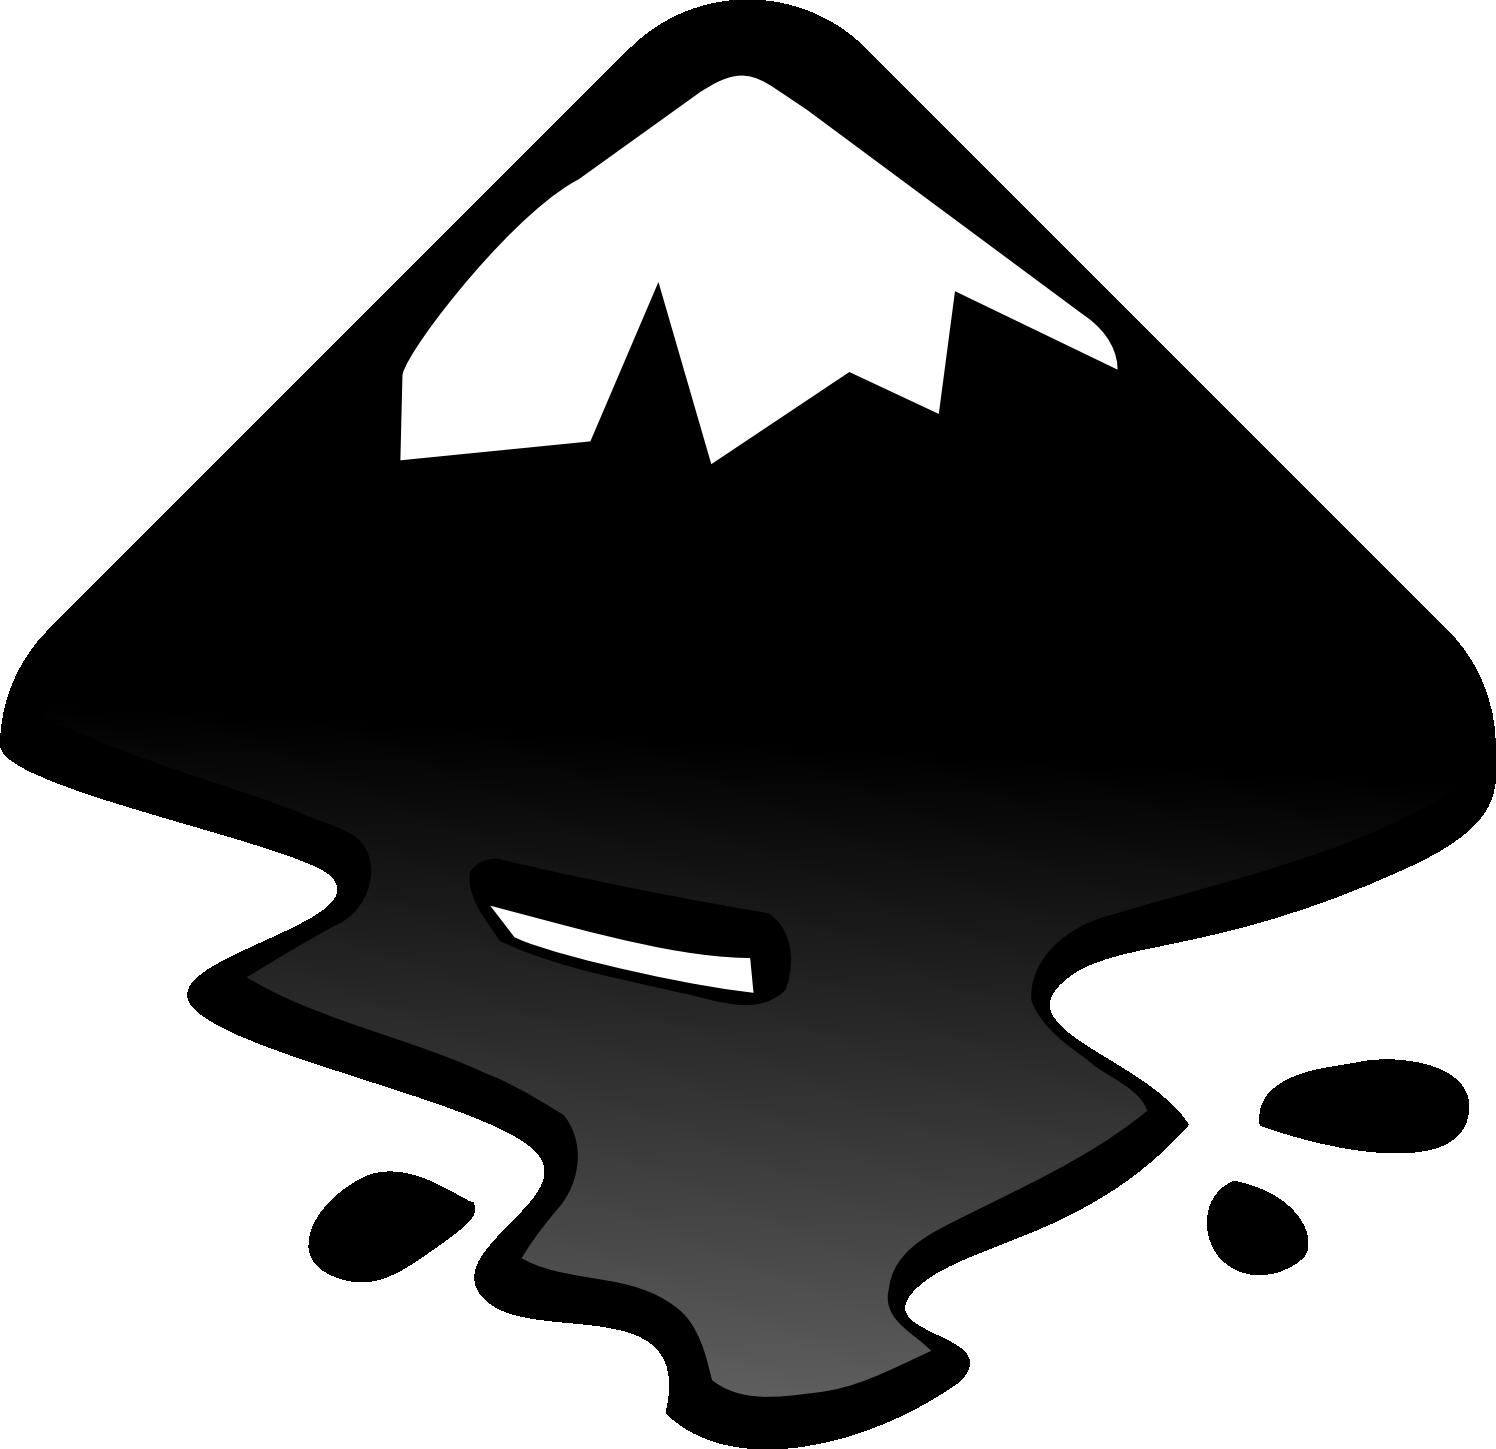 inkscape-logo-40.png?nocache=1309006691904